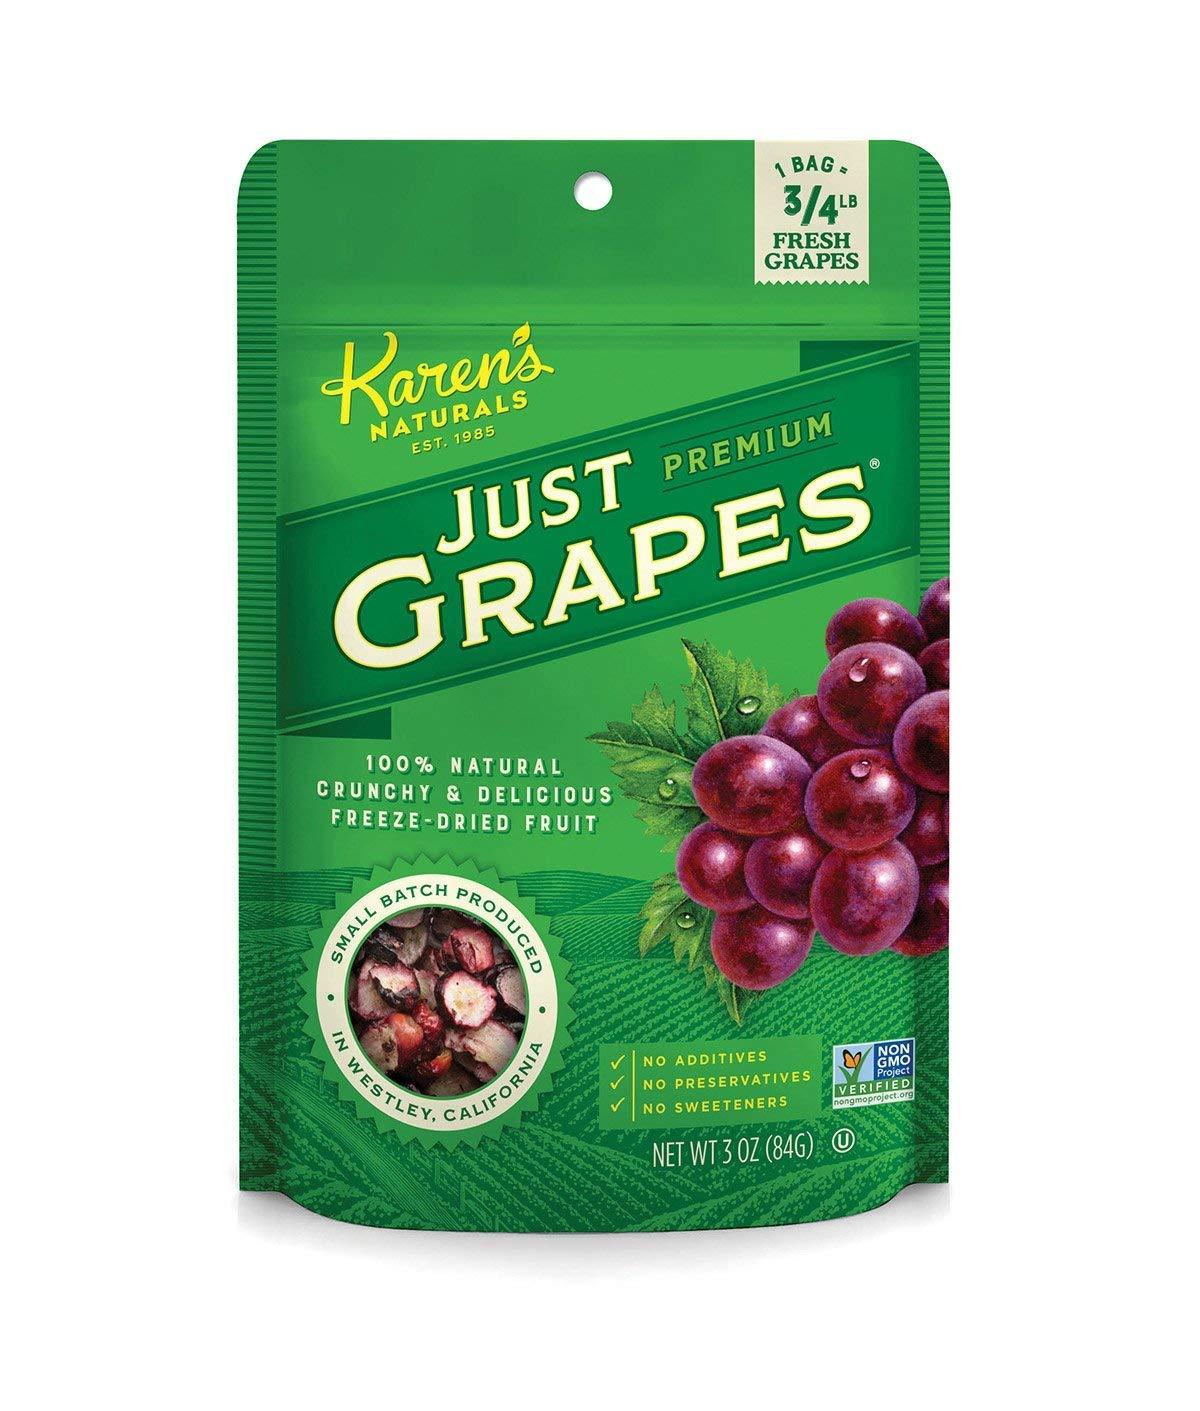 Frutas: Amazon.com: Grocery & Gourmet Food